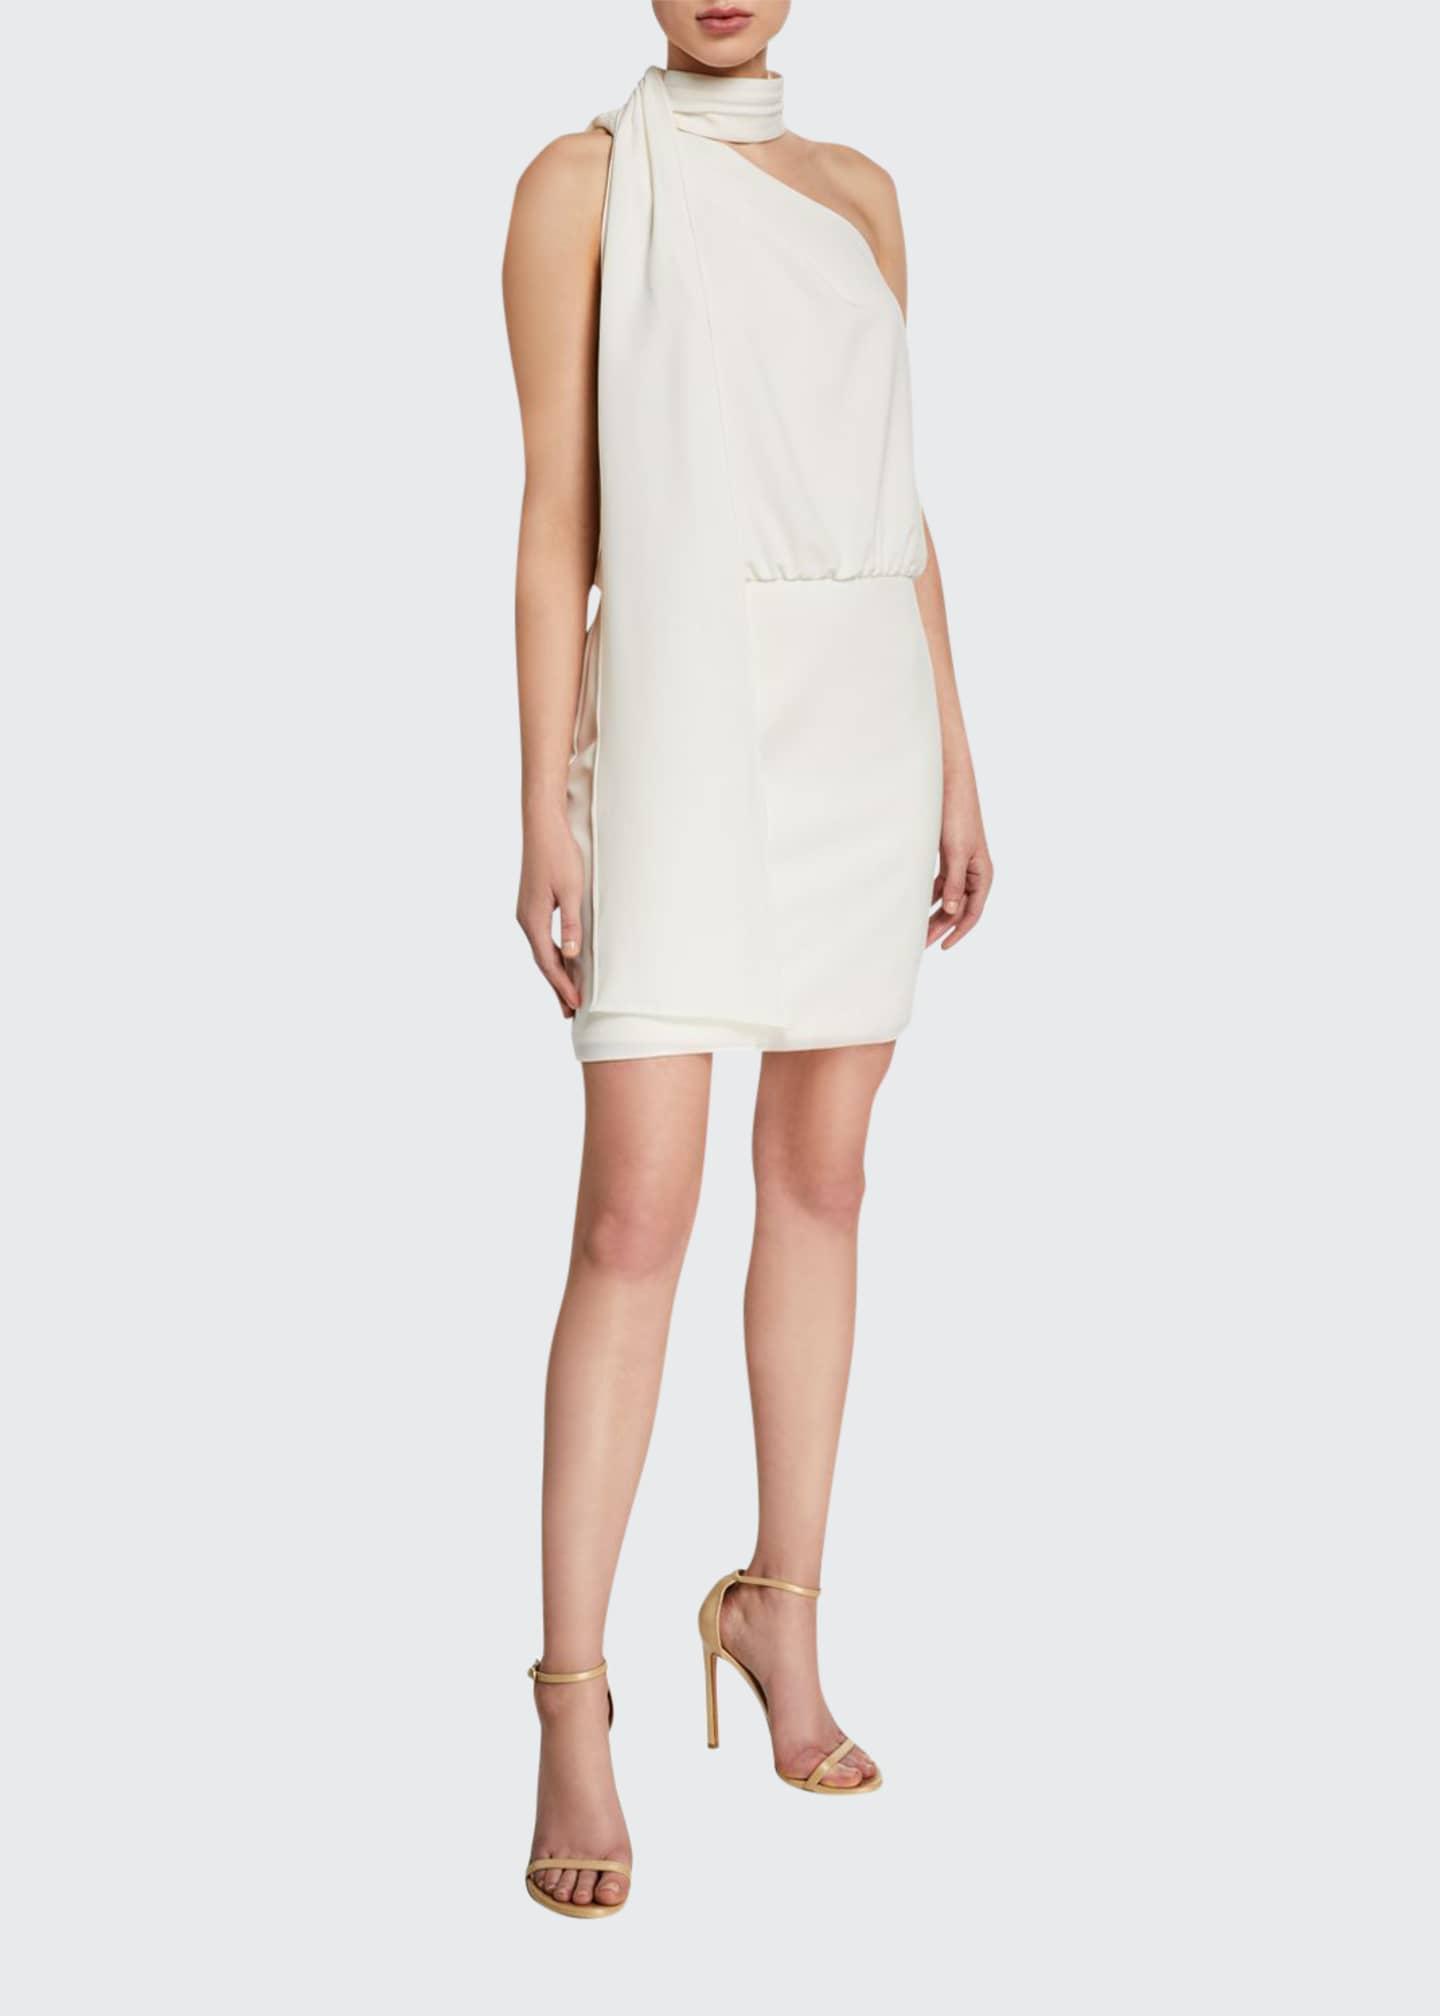 Halston Scarf Neck Sleeveless Cocktail Dress